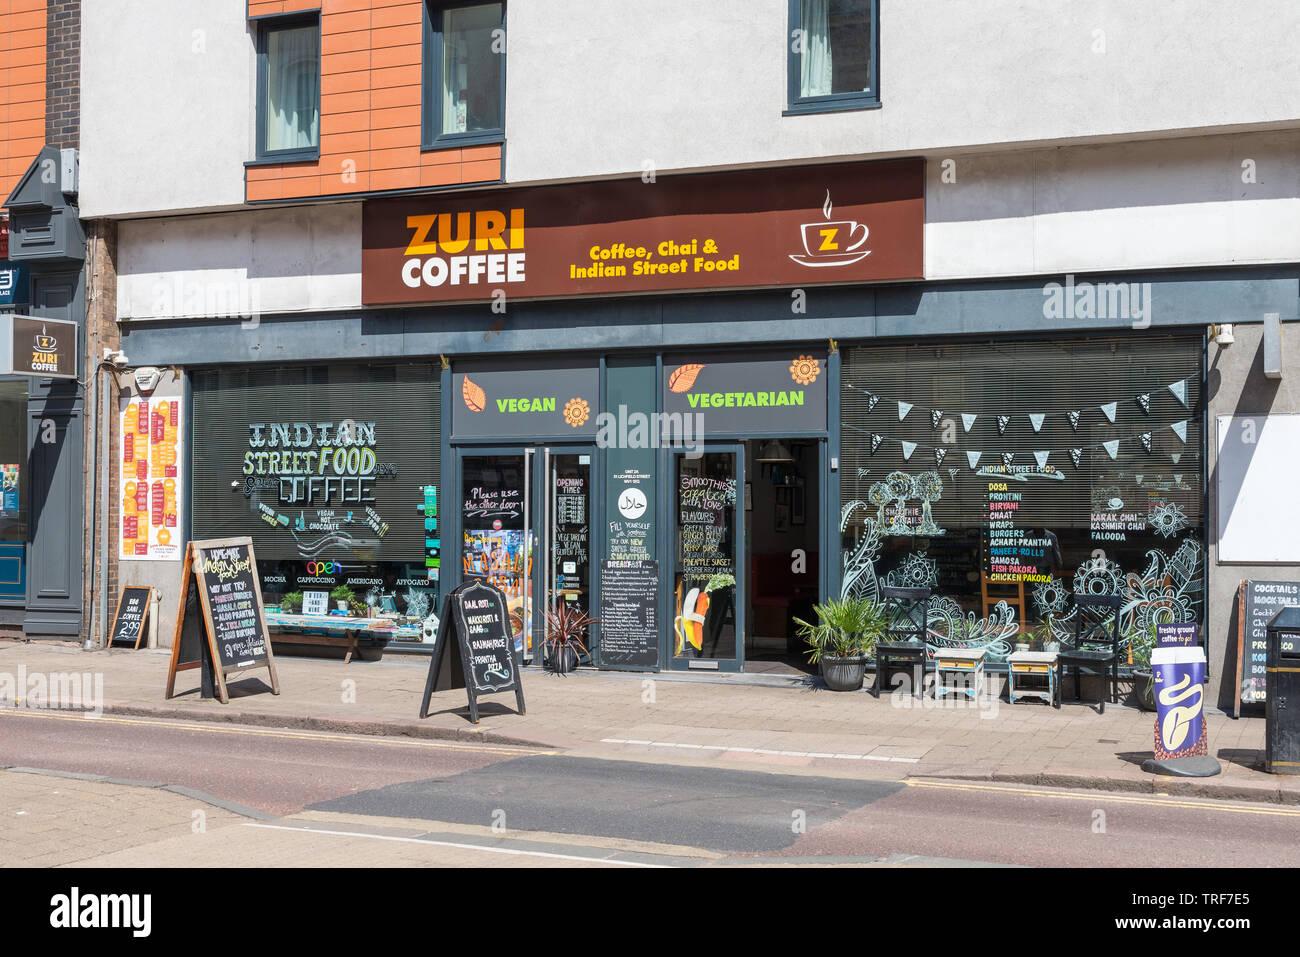 Zuri Coffee Lichfield Street Wolverhampton Cafe And Indian